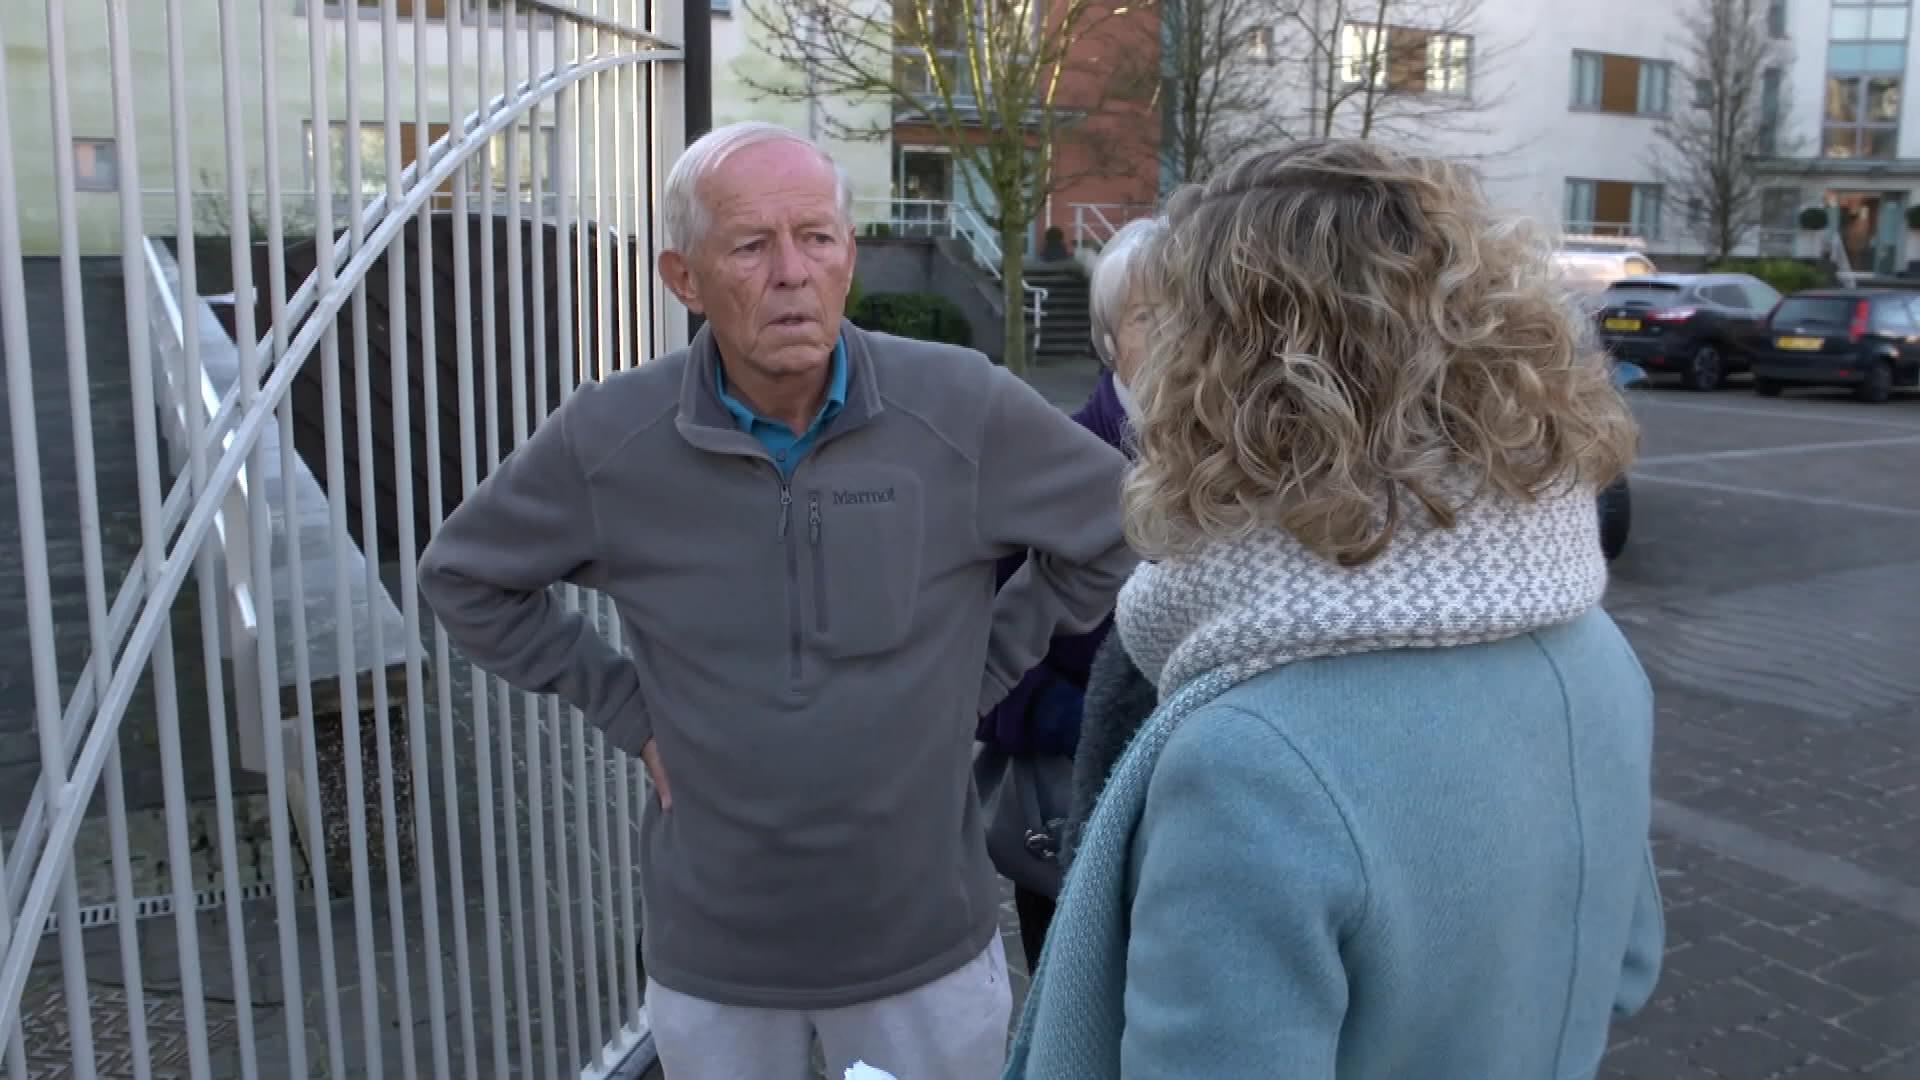 John Smyth being doorstepped